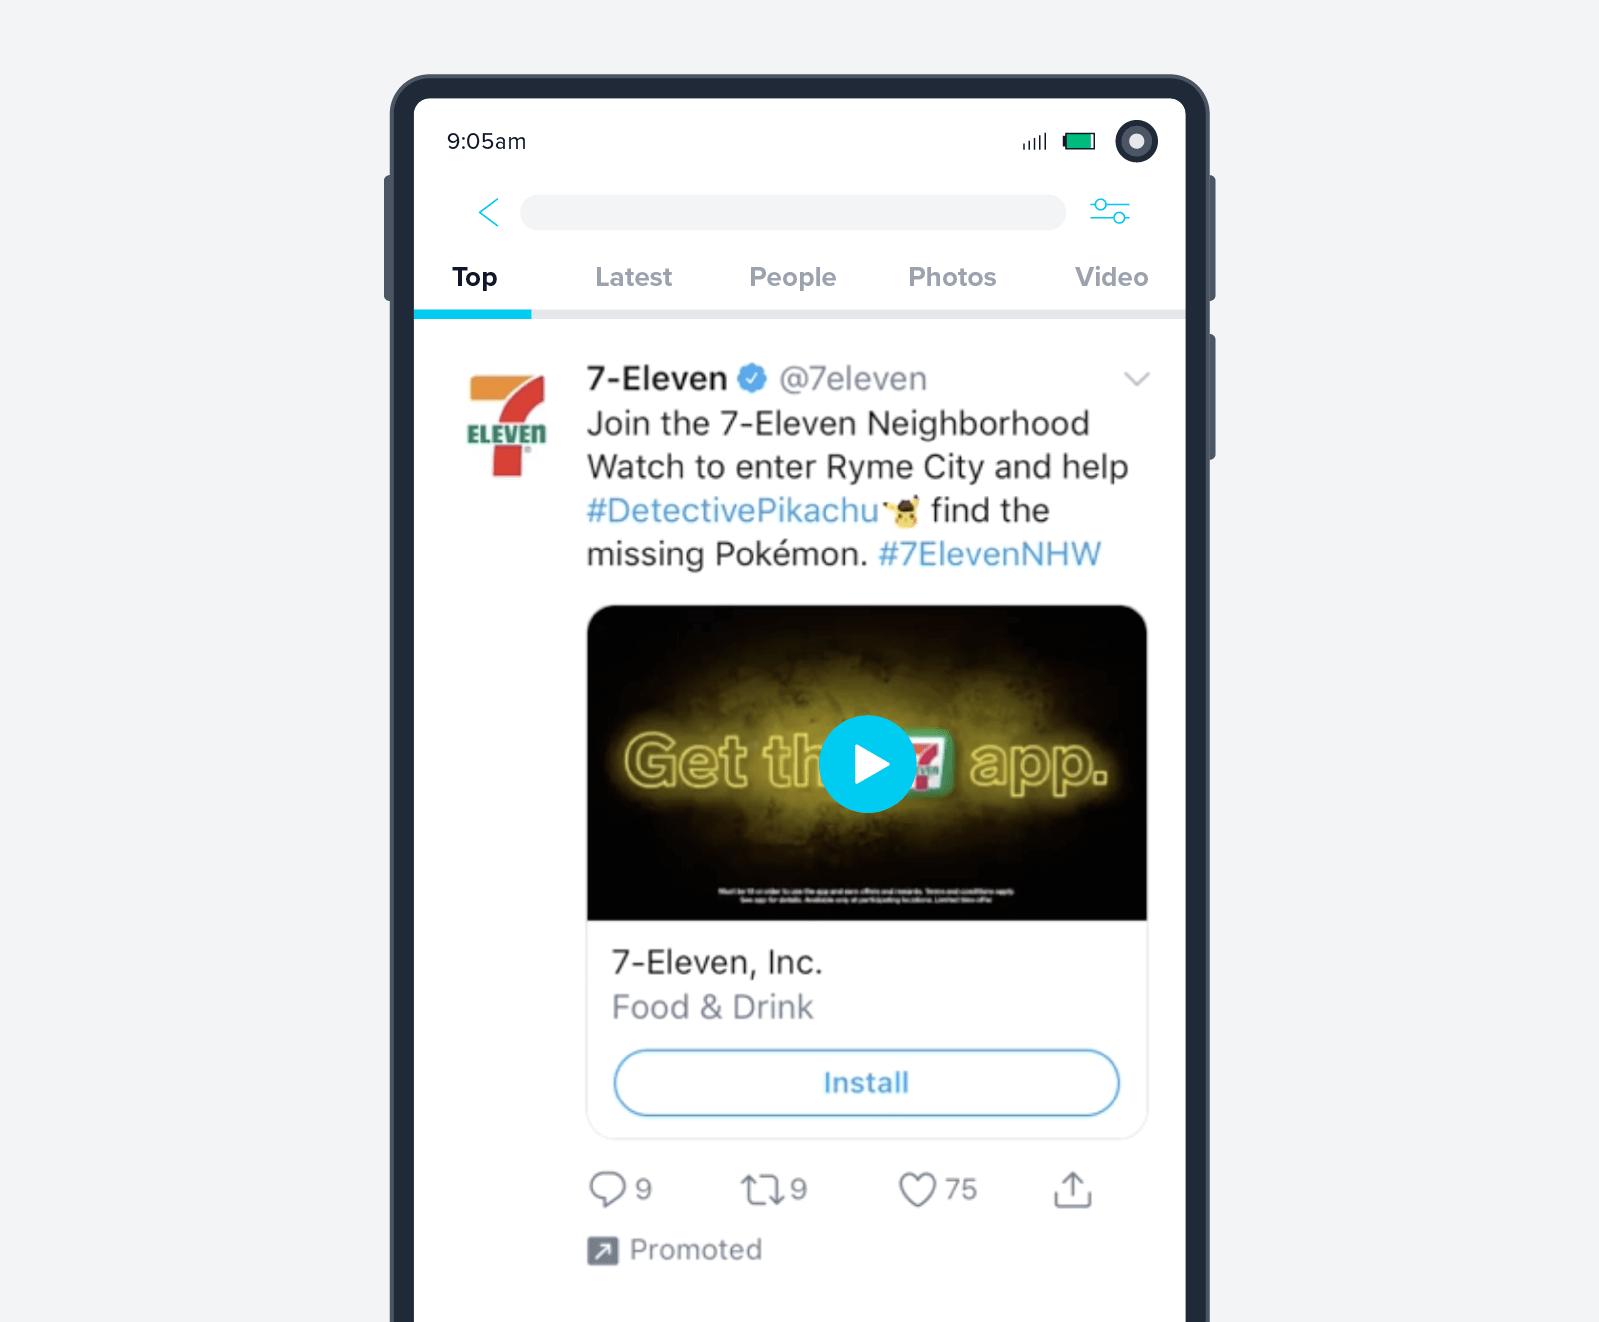 7Eleven app install ad